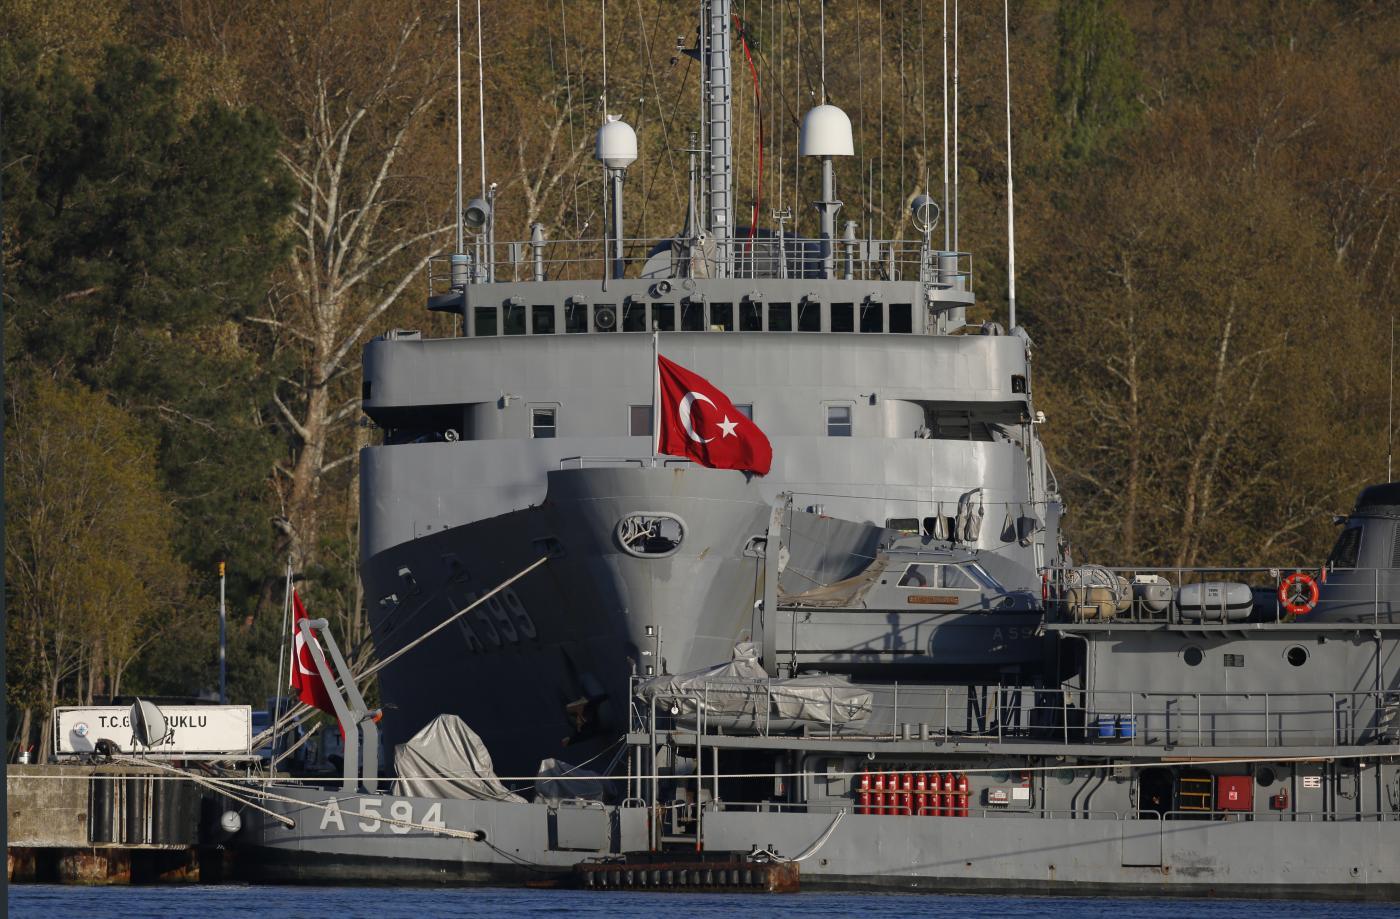 Turchia, Marina turca (la Presse)